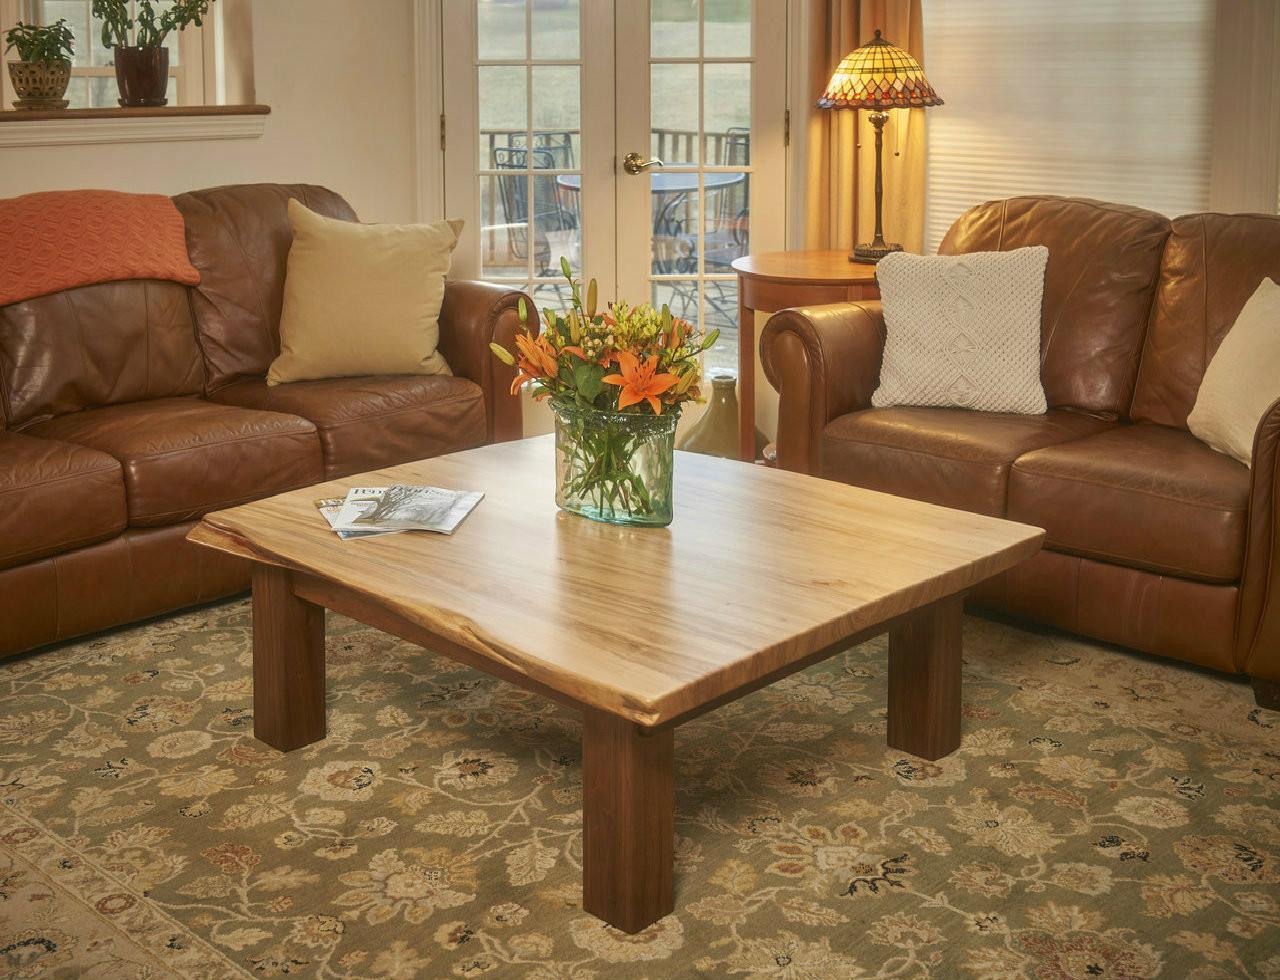 Customizable Tables